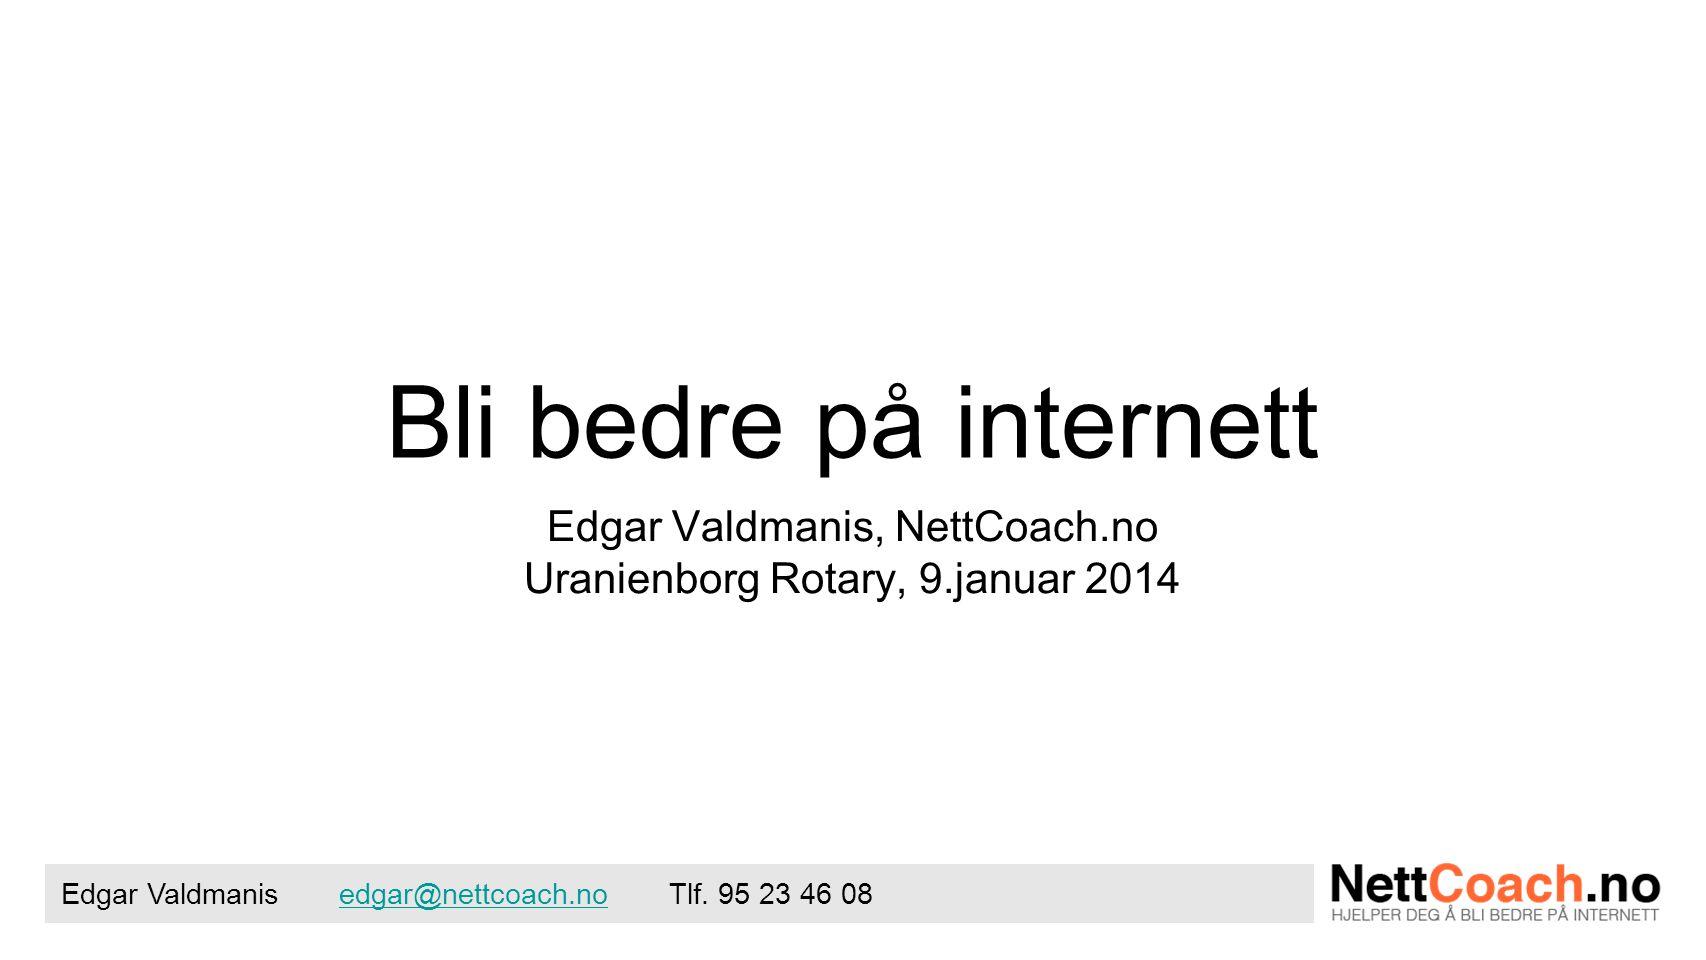 Bli bedre på internett Edgar Valdmanis, NettCoach.no Uranienborg Rotary, 9.januar 2014 Edgar Valdmanis edgar@nettcoach.no Tlf.